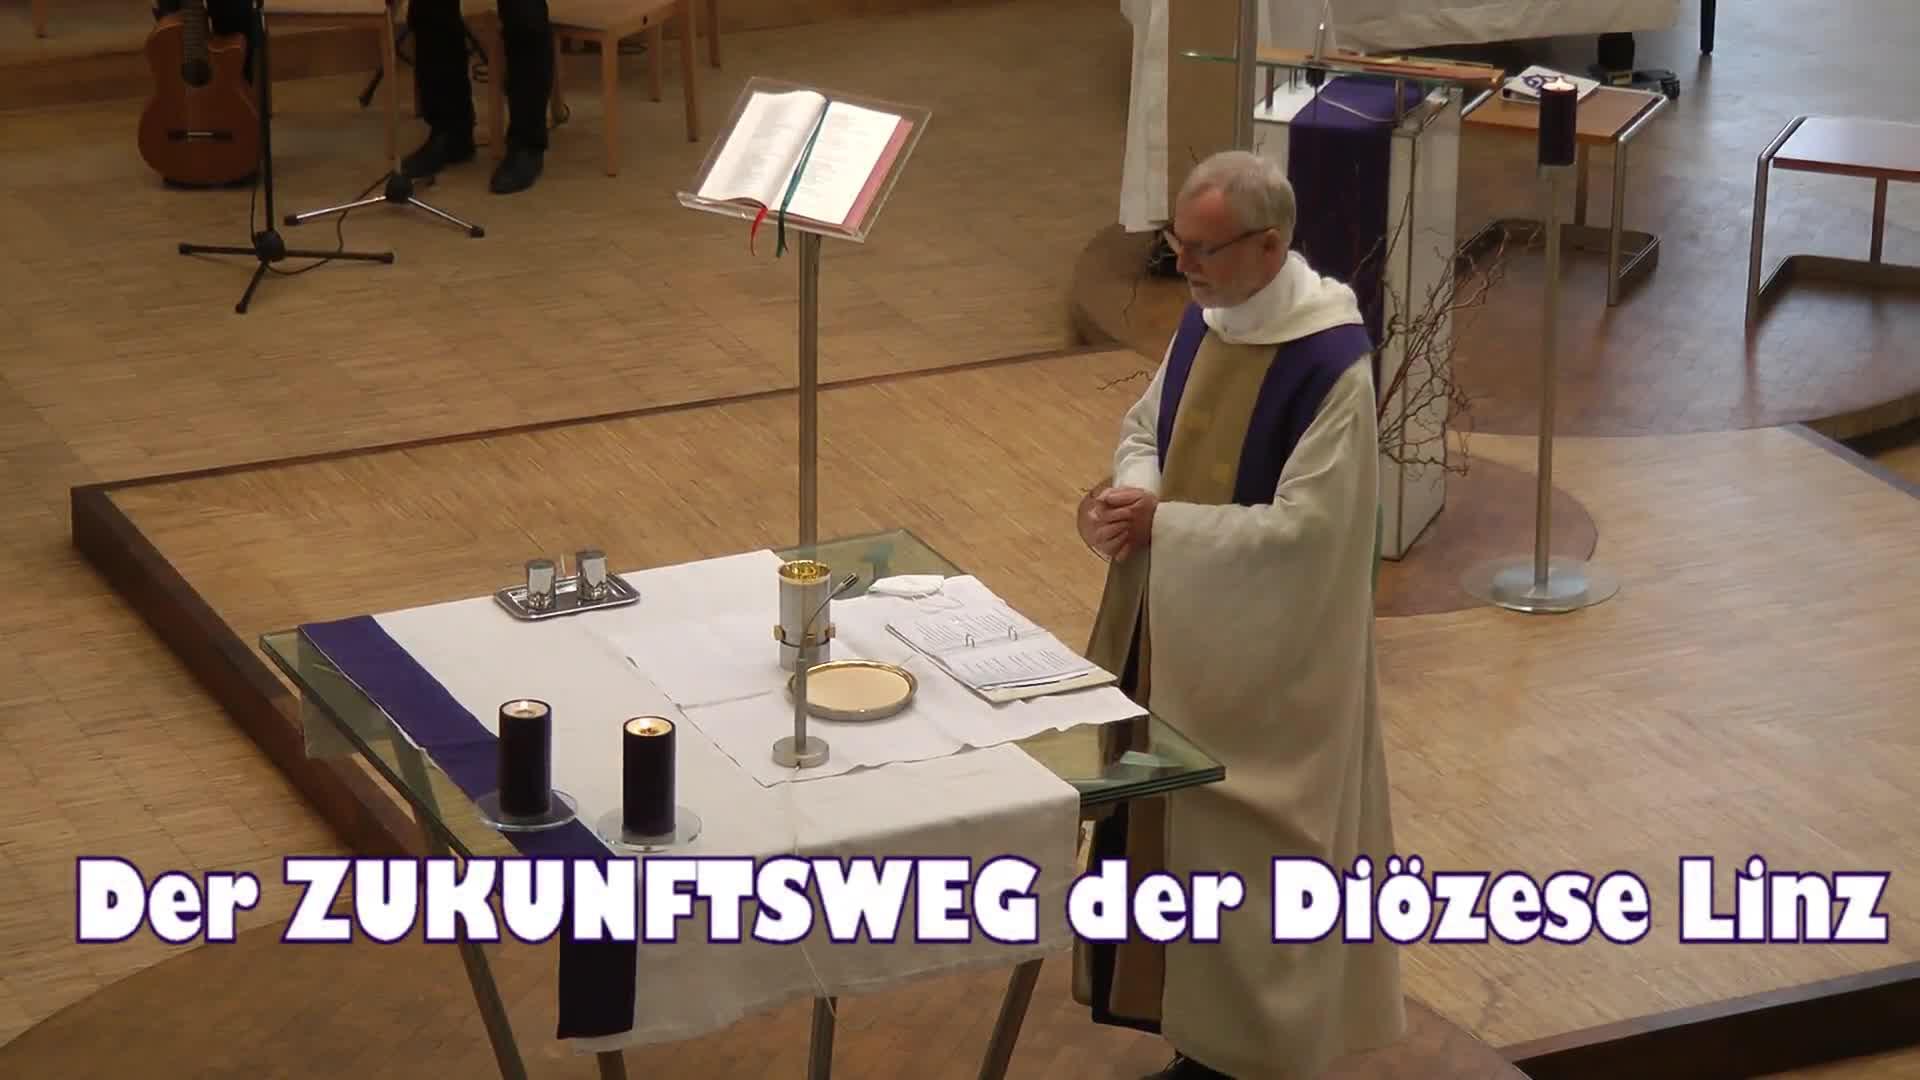 Der Zukunftsweg der Diözese Linz